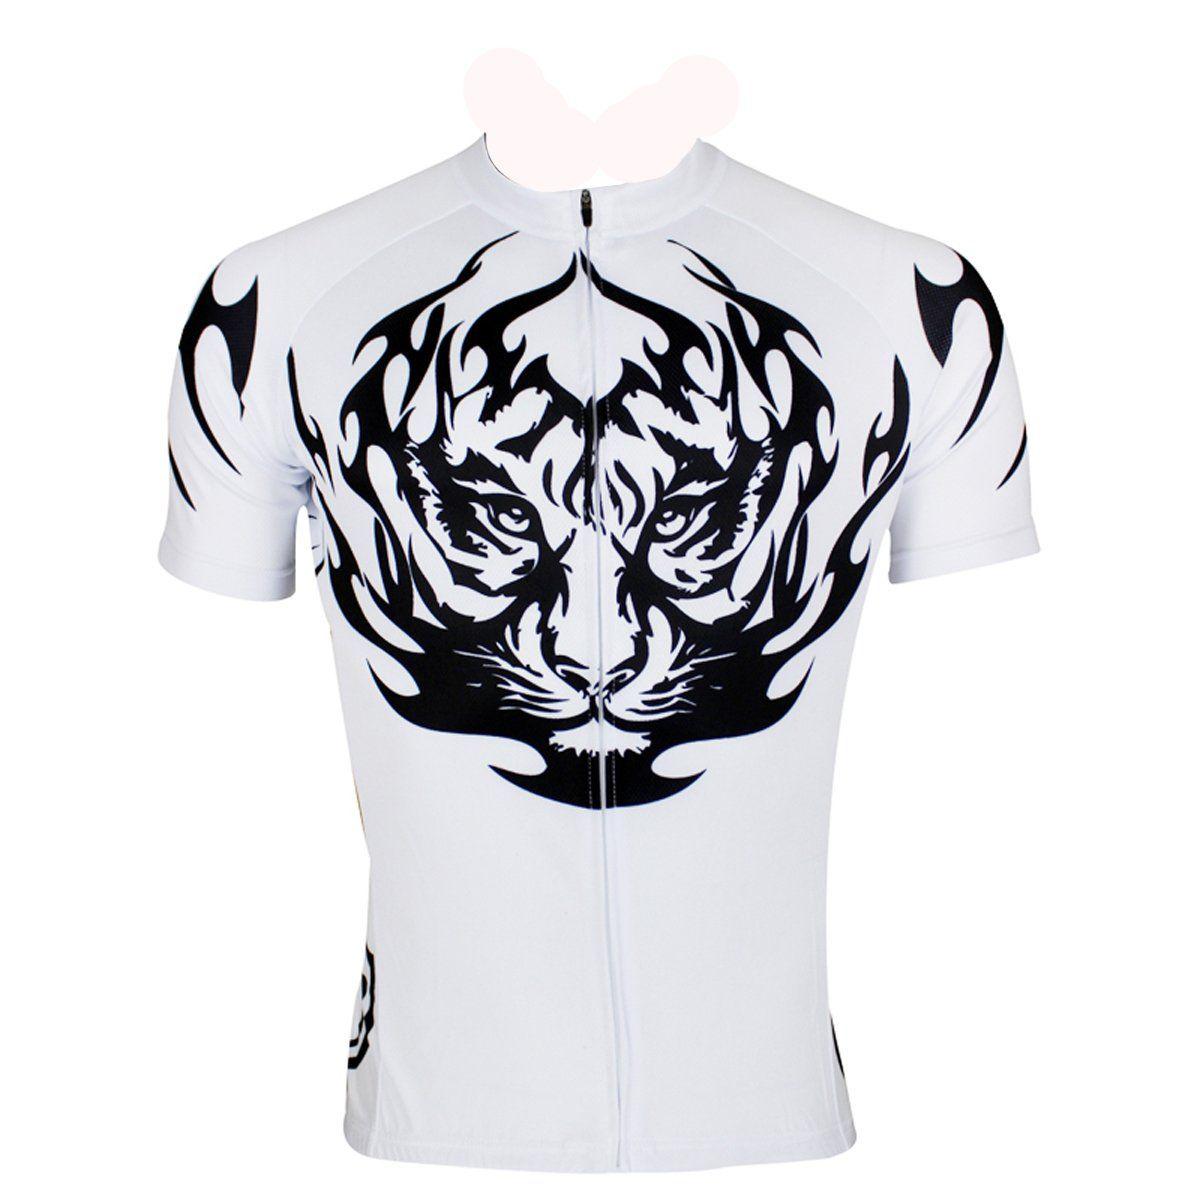 Ilpaladino Tiger White Men s Shirt Cycling Jersey Sportswear Bicycling Pro  Cycle Clothing Racing Apparel Outdoor Sports Leisure Biking T-shirt Summer  NO.117 ... 143e28d9a